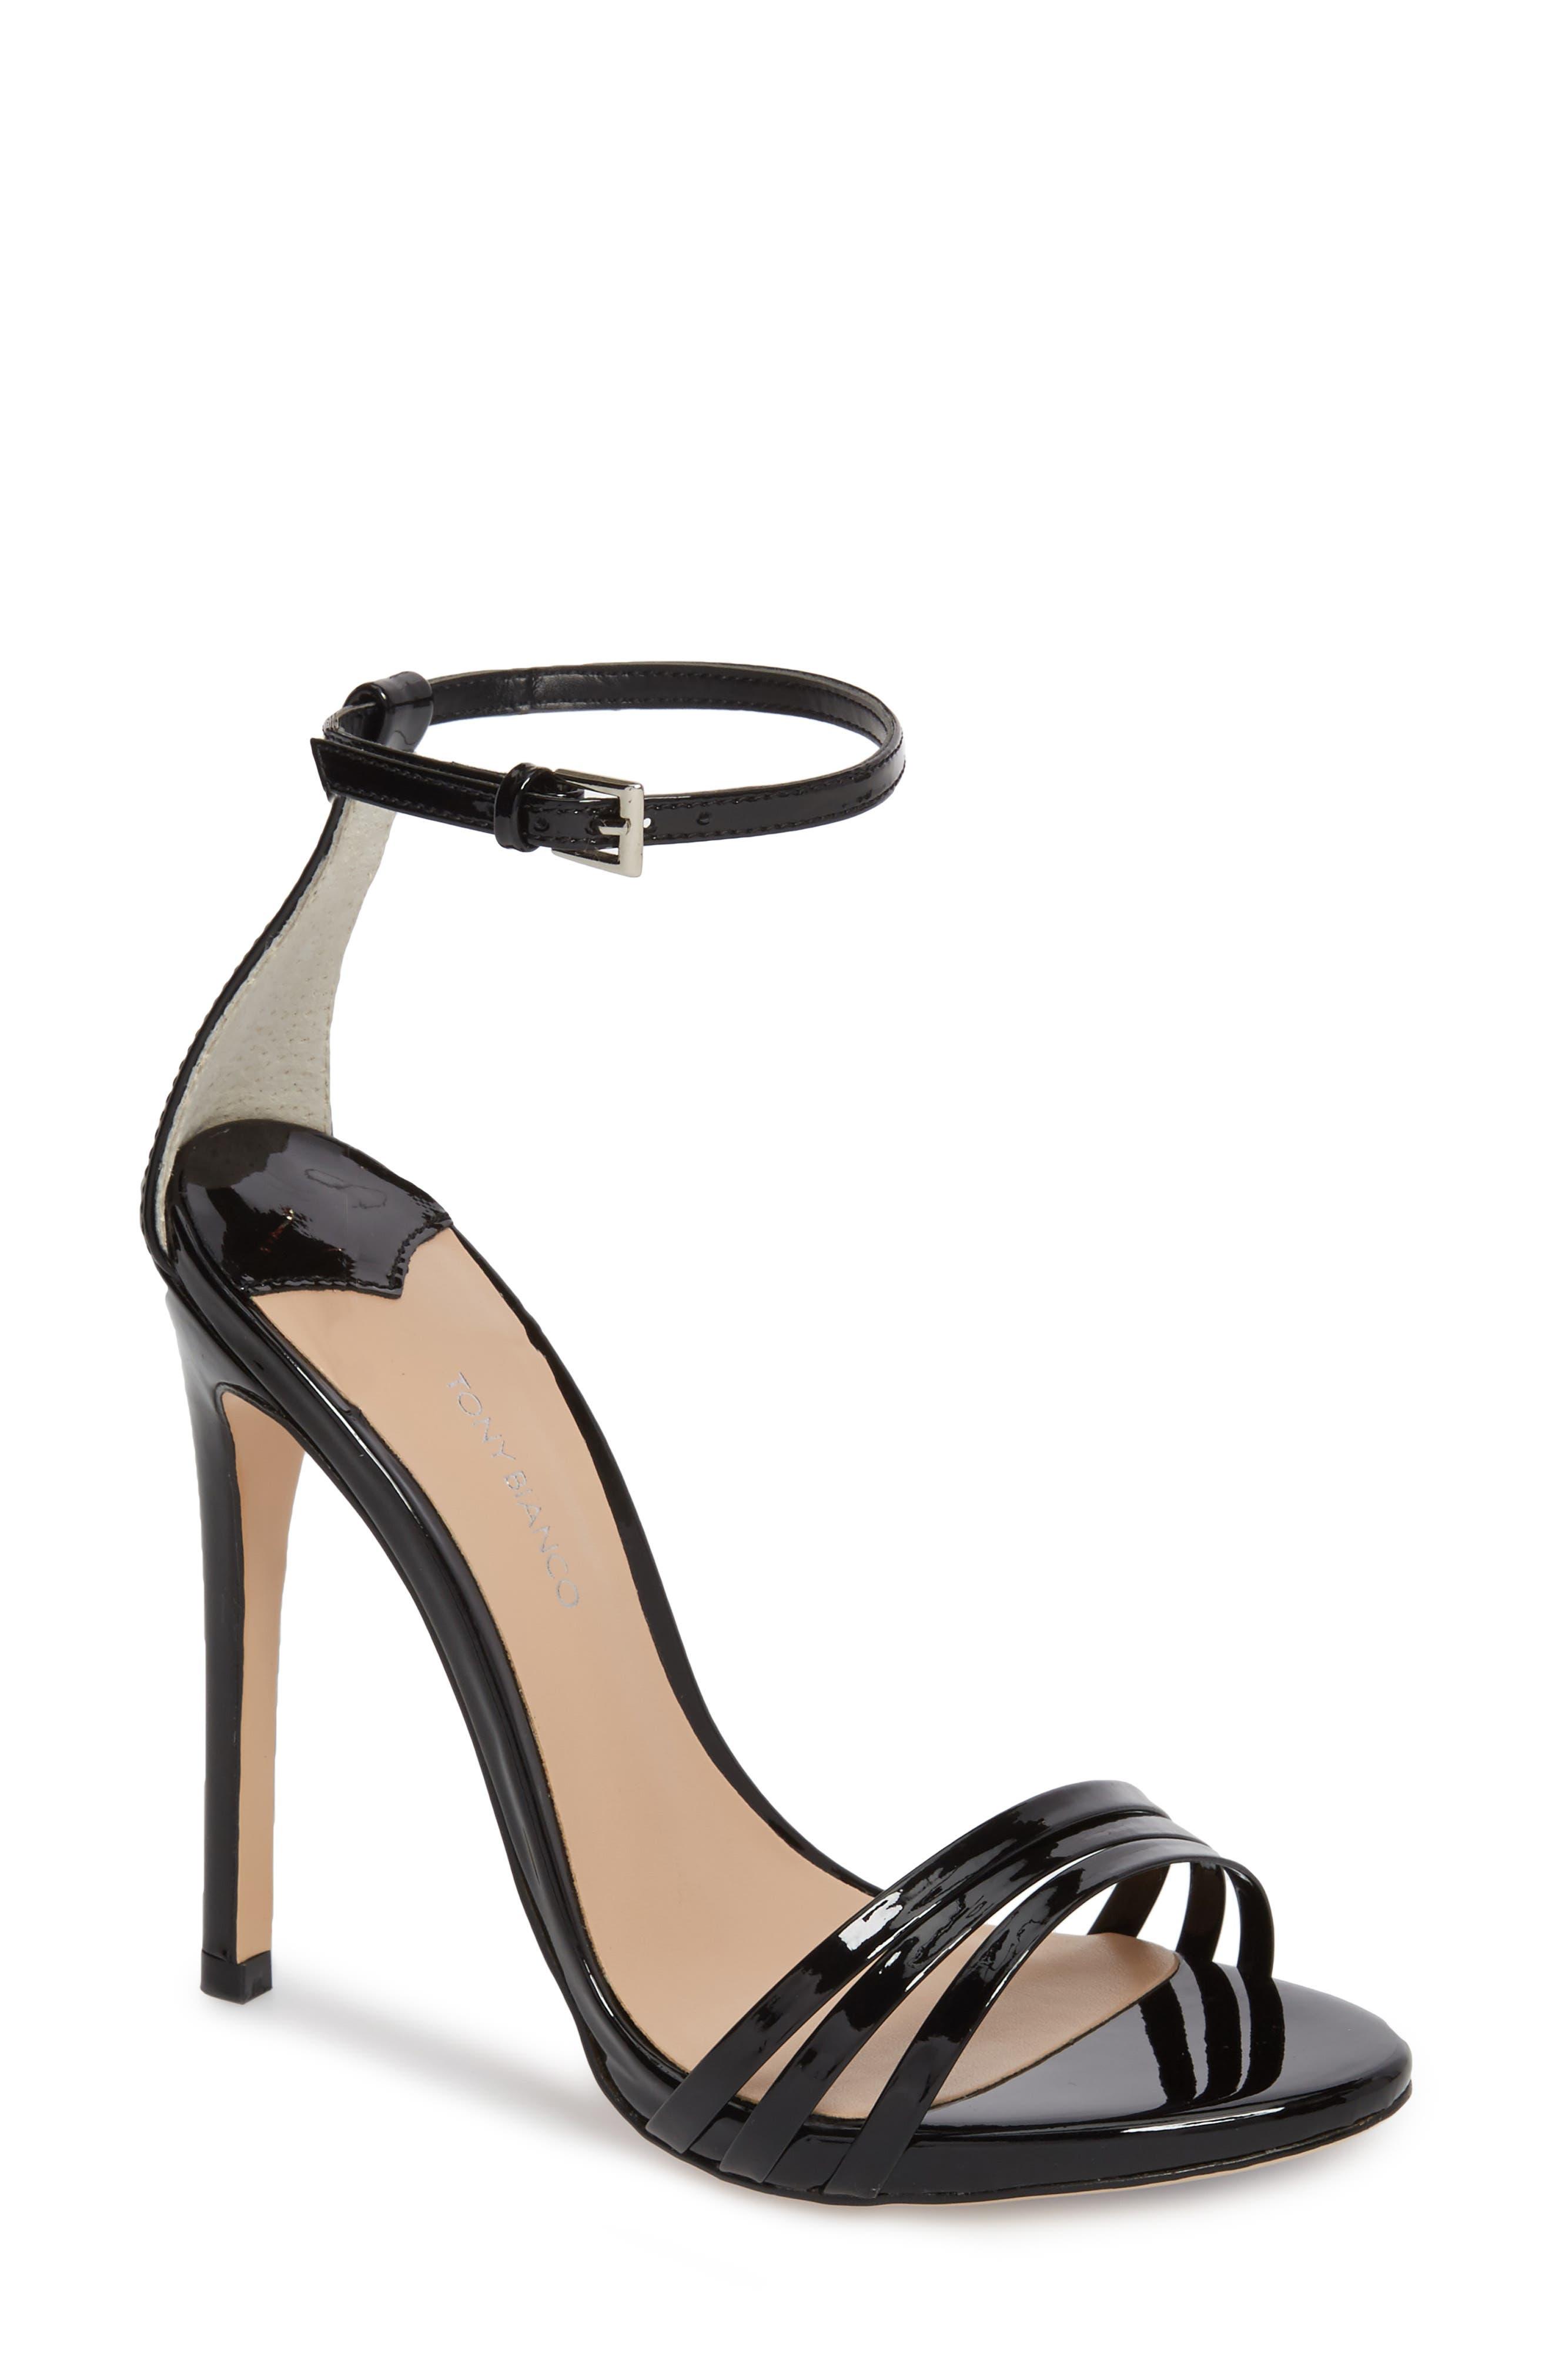 Tony Bianco Aroma Strappy Sandal- Black